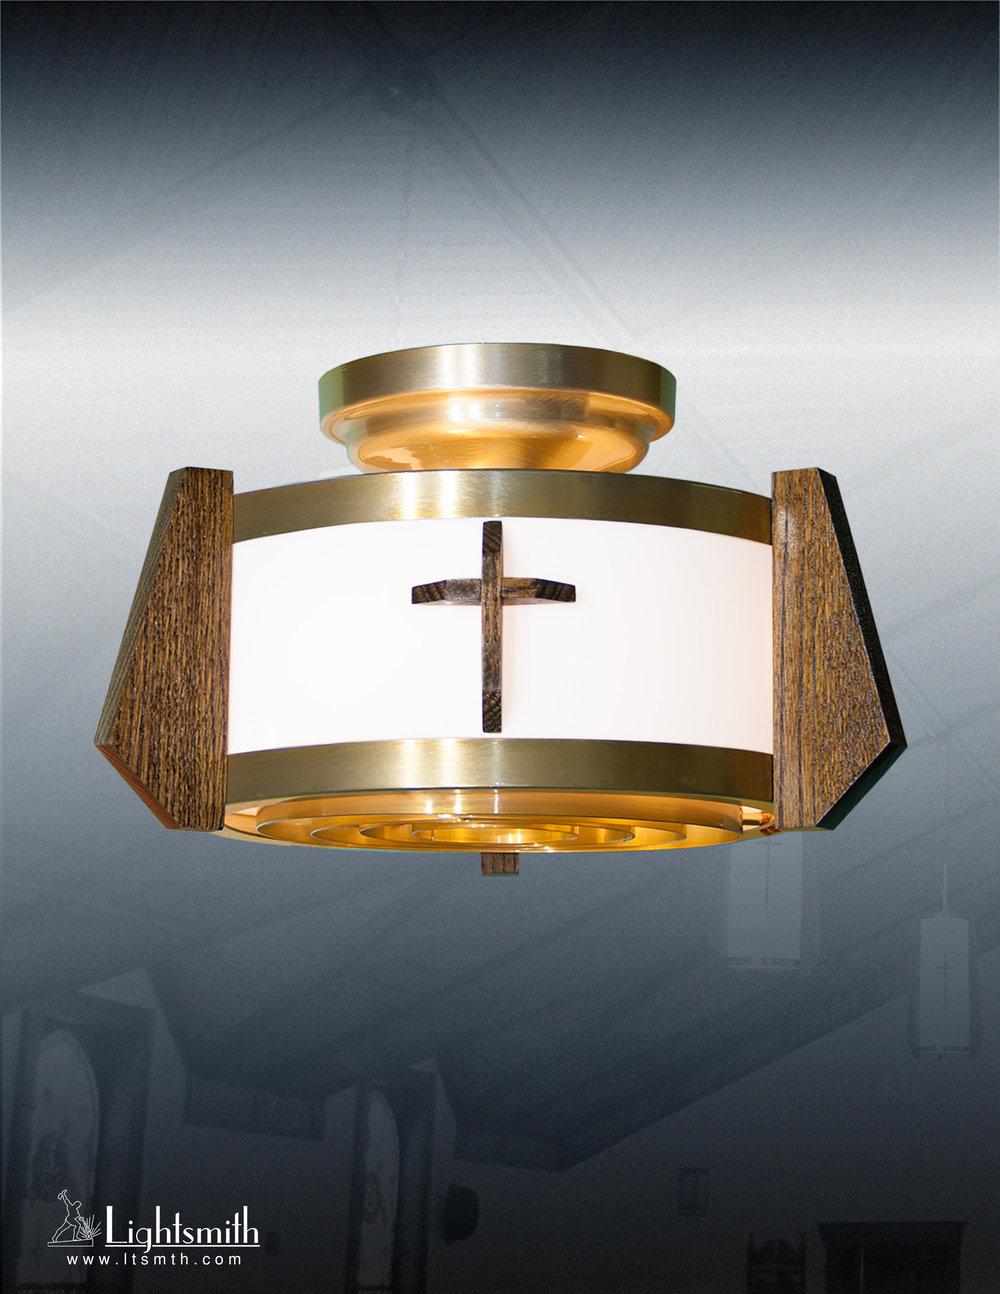 416-CC - Satin Gold - Medium Oak -White Acrylic